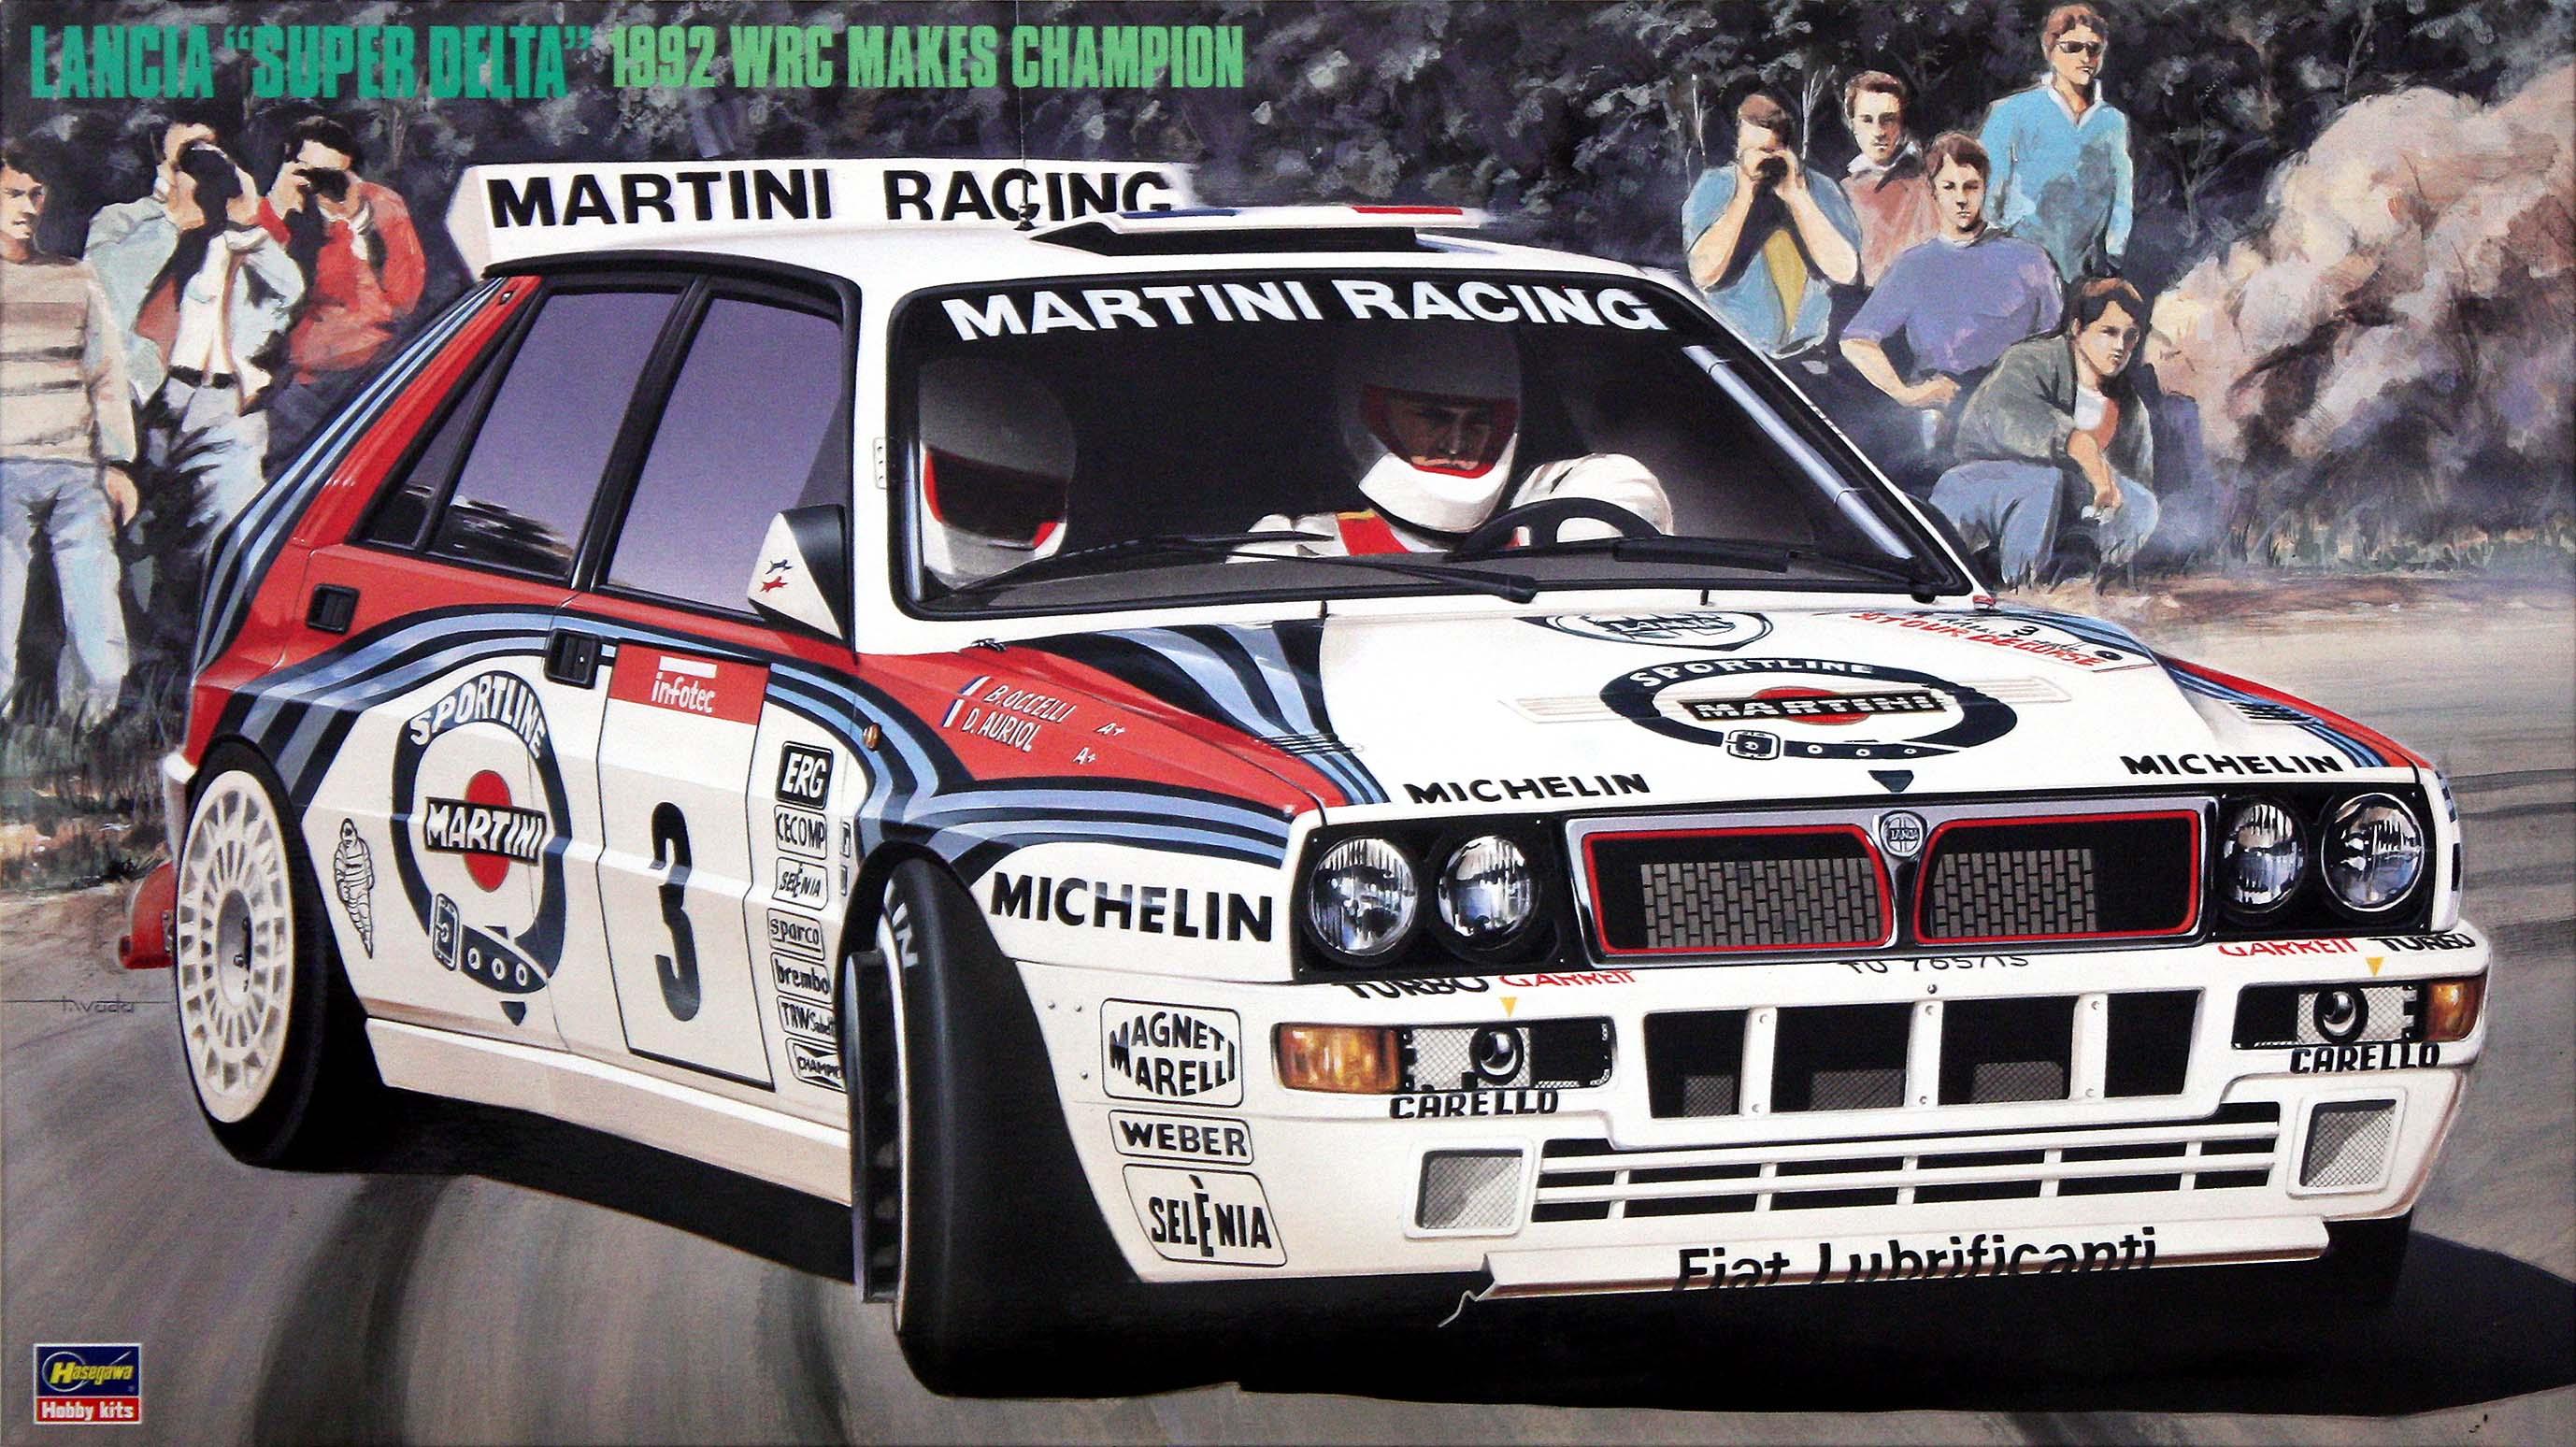 "Hasegawa Lancia ""Super Delta"" ('92 Wrc Makes Champion)"